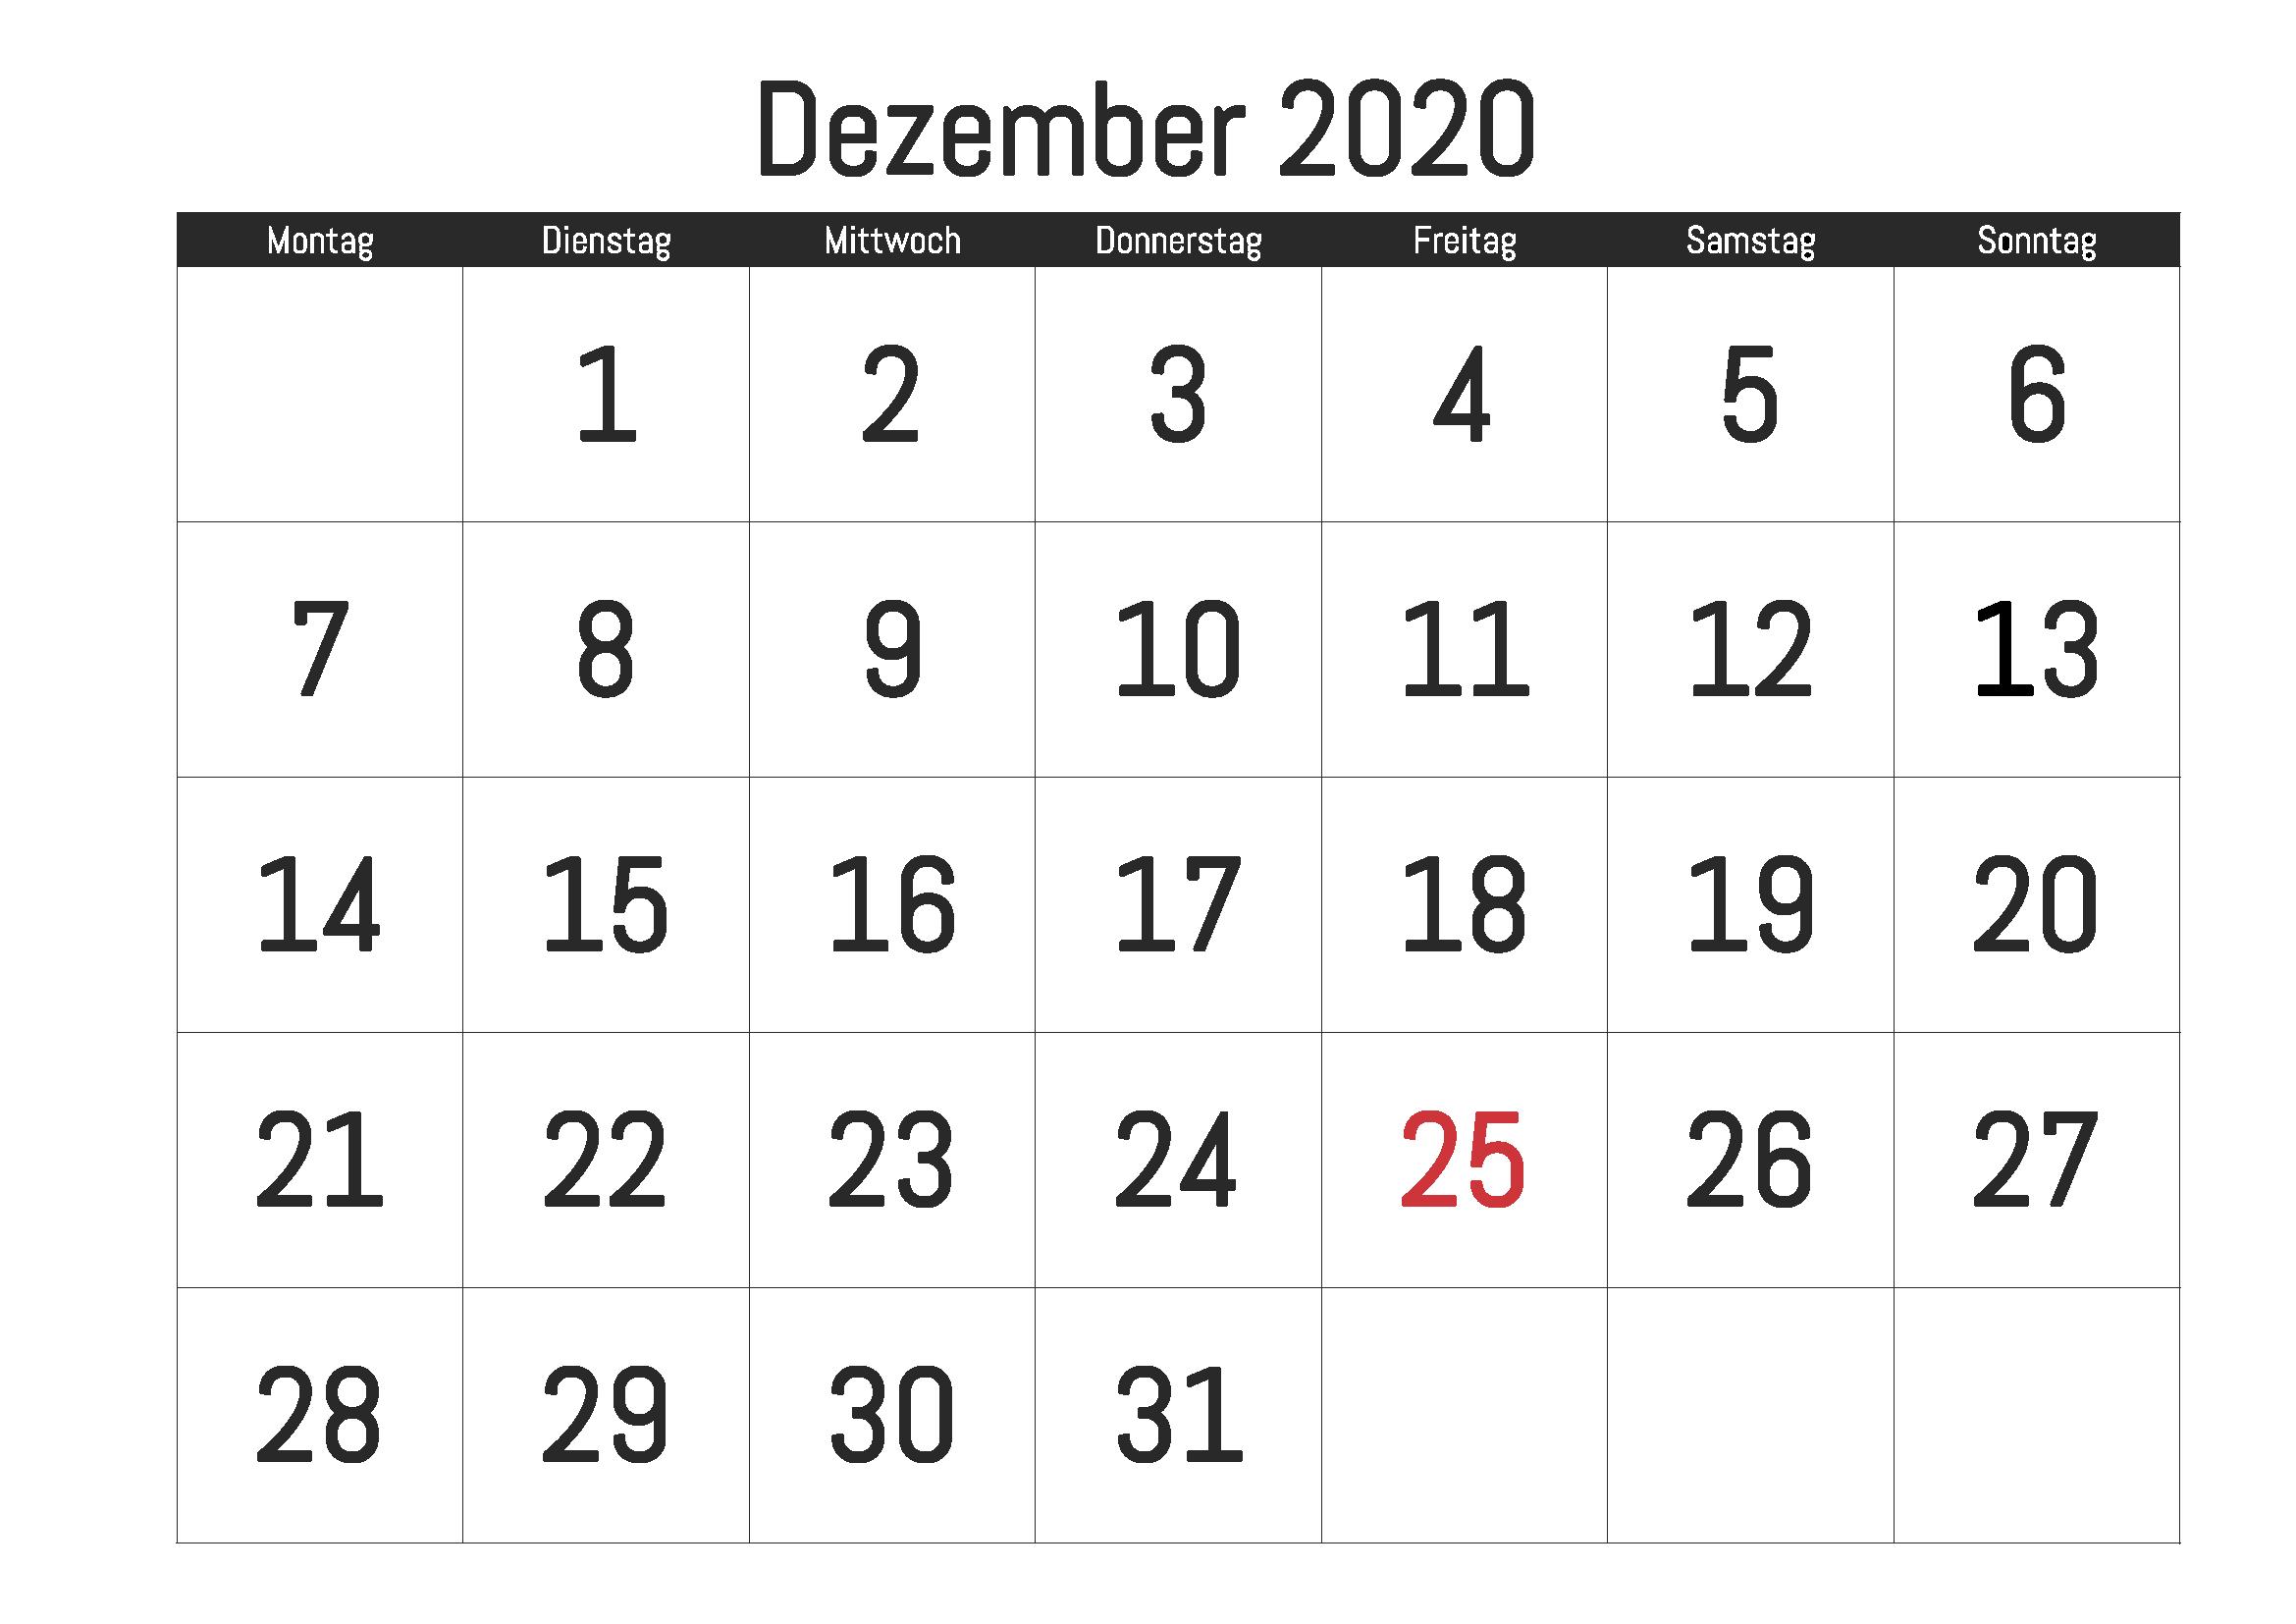 Dezember 2021 Kalender Ausdrucken